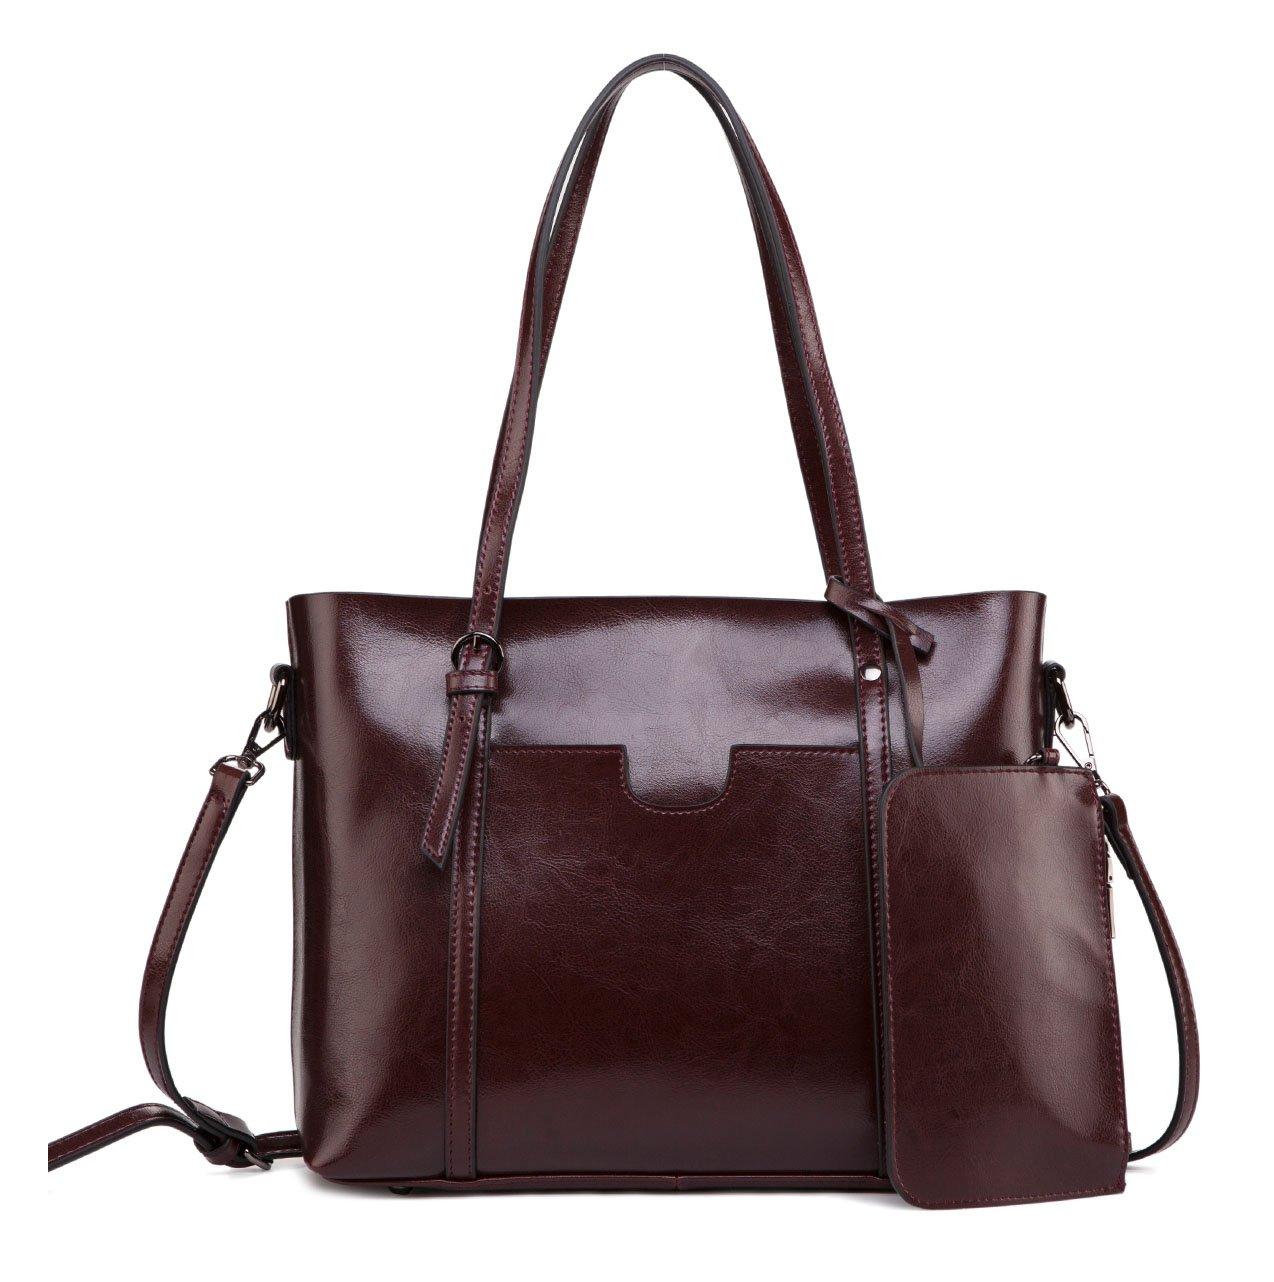 ilishop Genuine Leather Tote Classical Purse Large Capacity Handbag Top Handle Satchel Vogue Cross-bady Shoulder Bag (Winered)